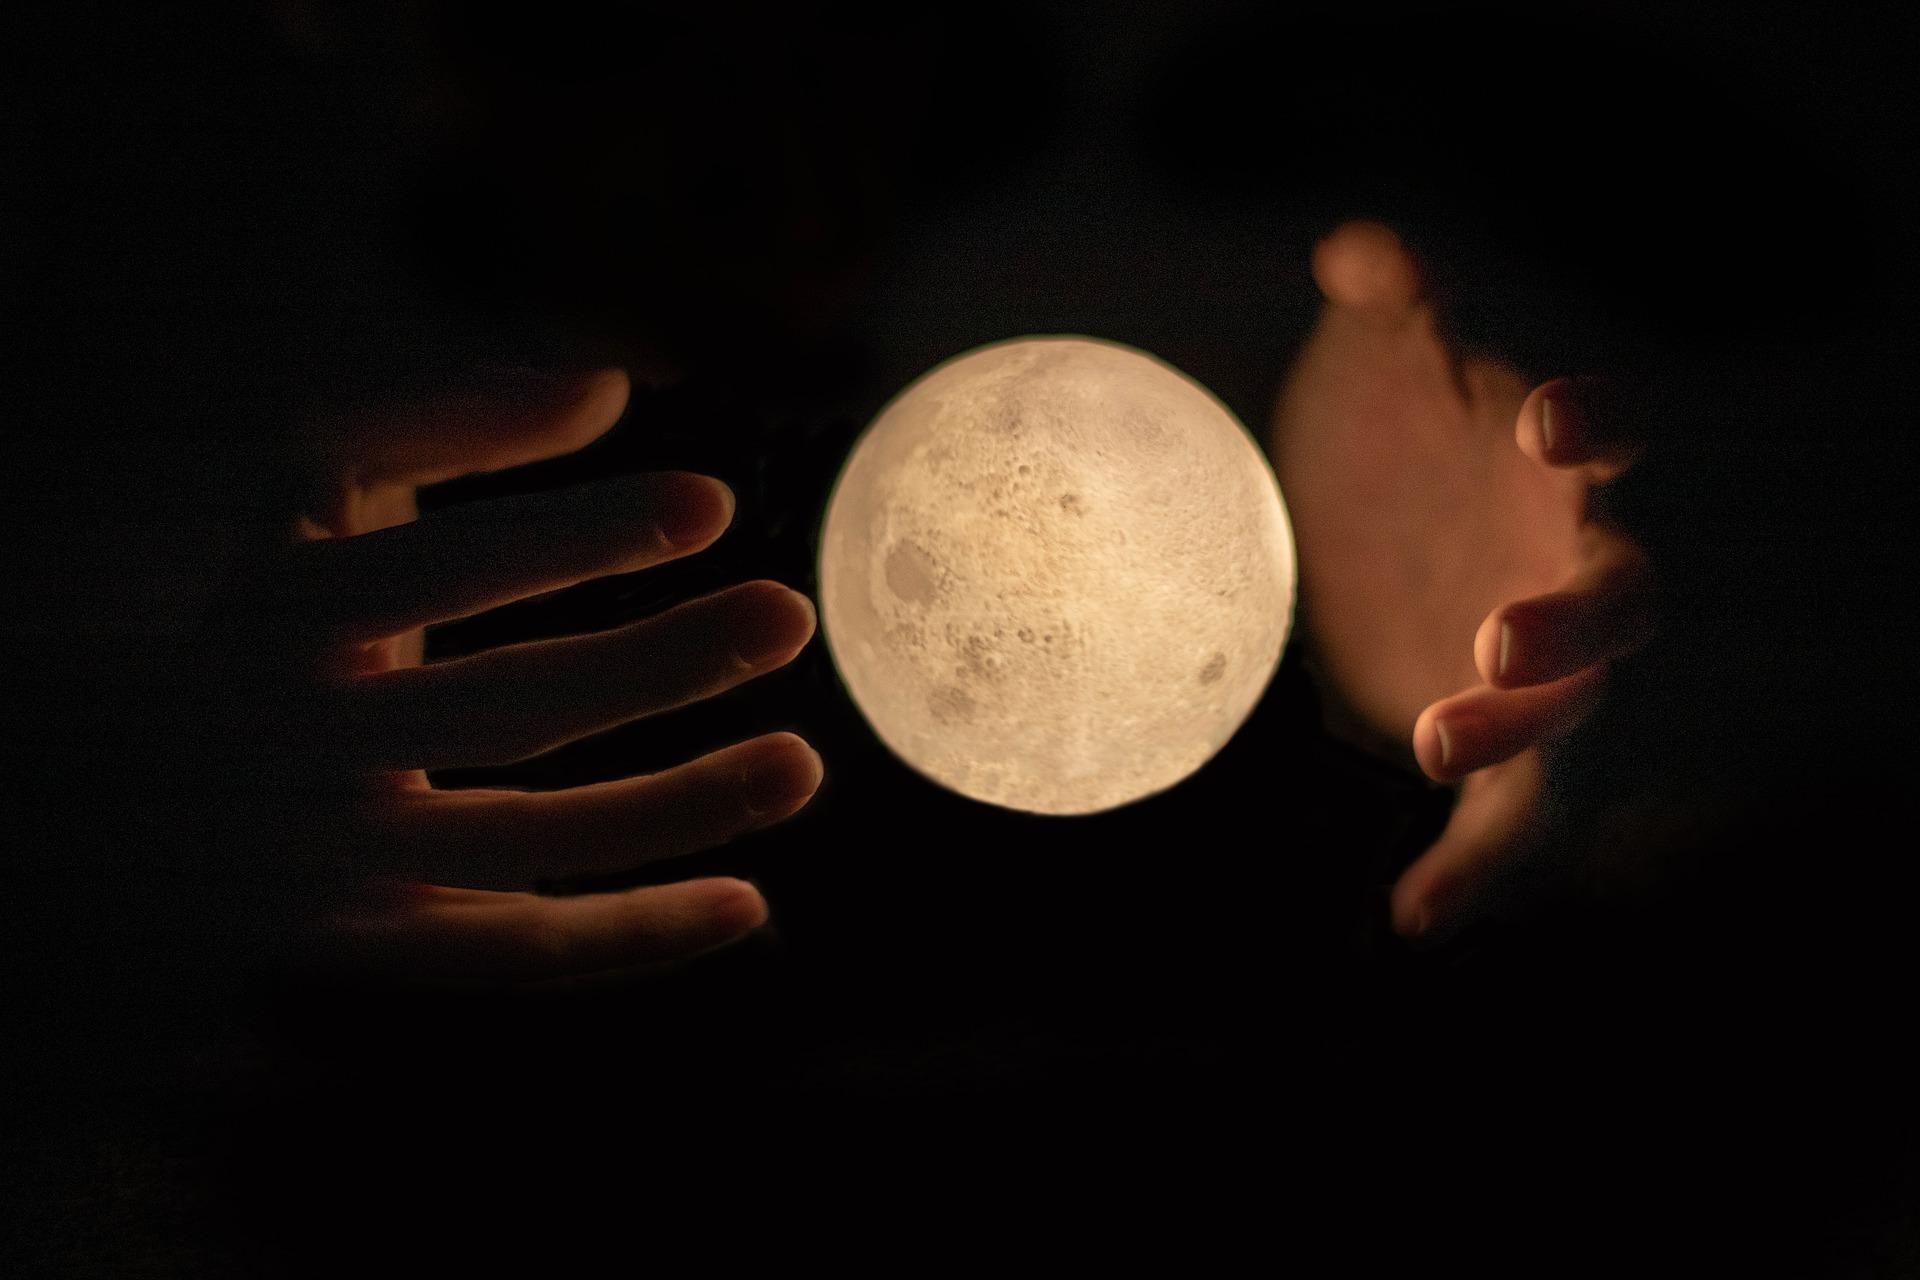 Fuldmåne, ildceremoni, ritual, månecyklus